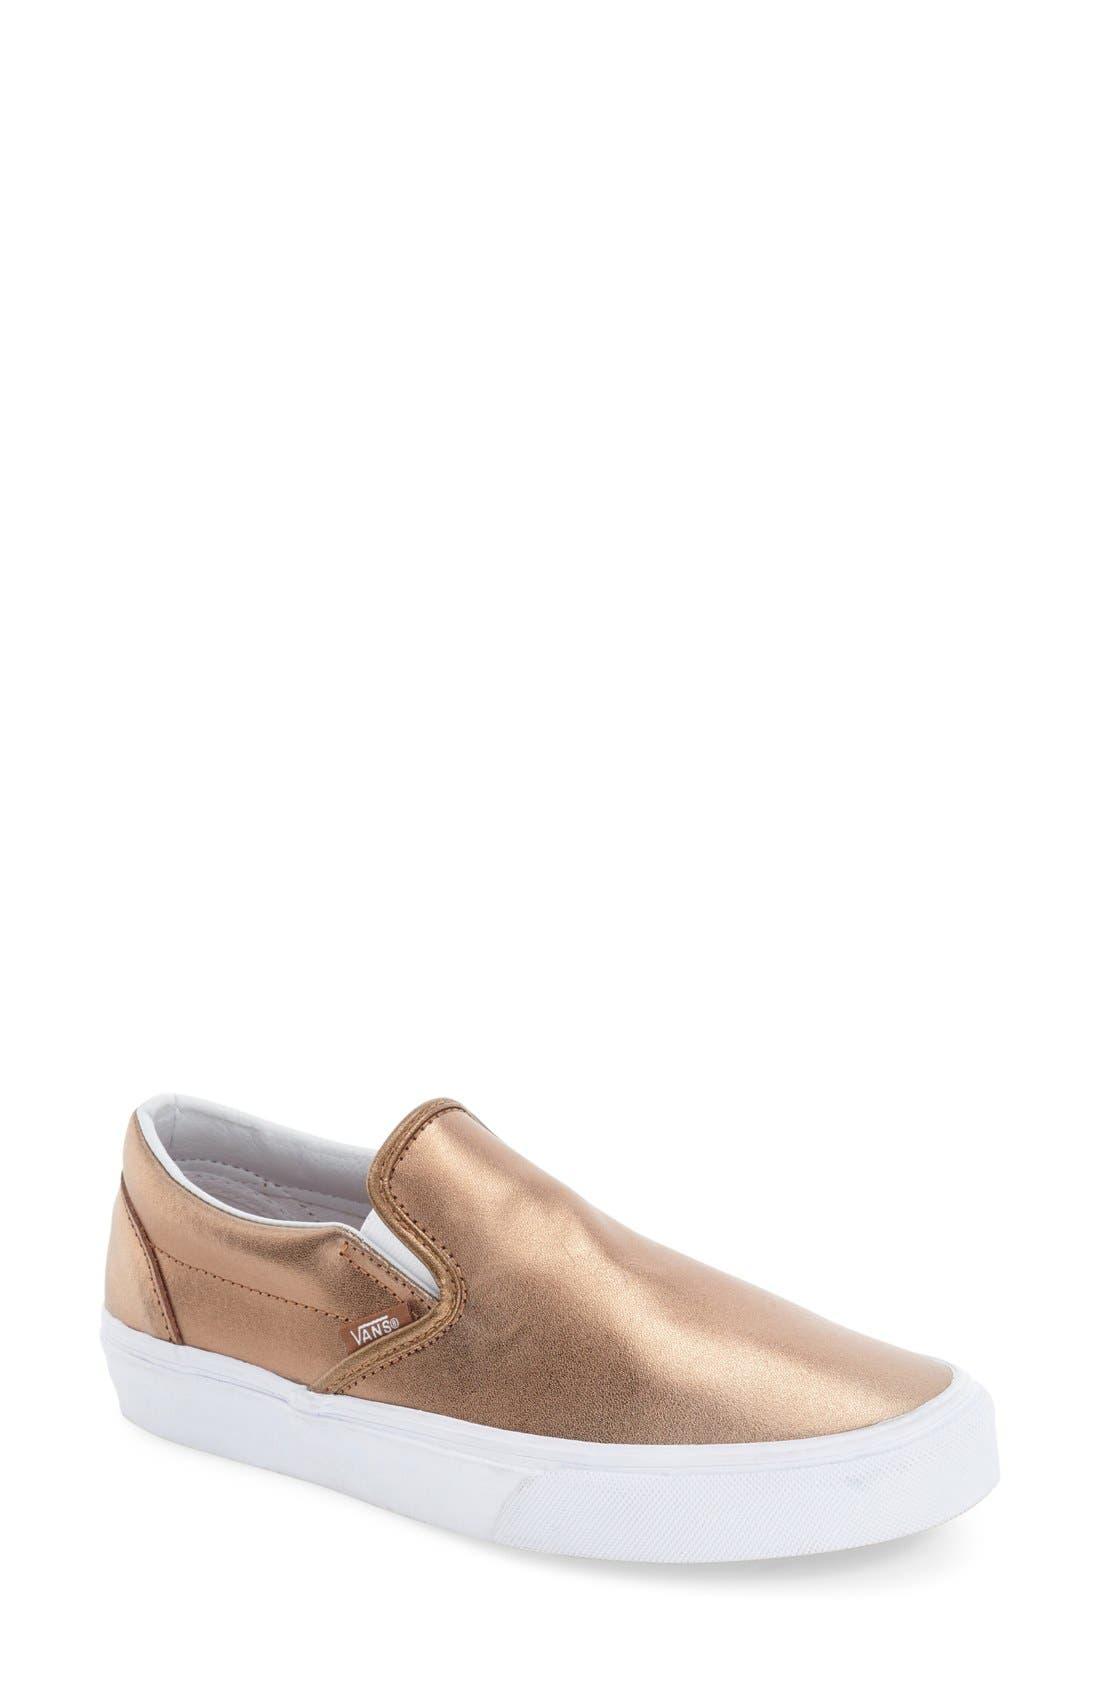 ,                             Classic Slip-On Sneaker,                             Main thumbnail 314, color,                             220